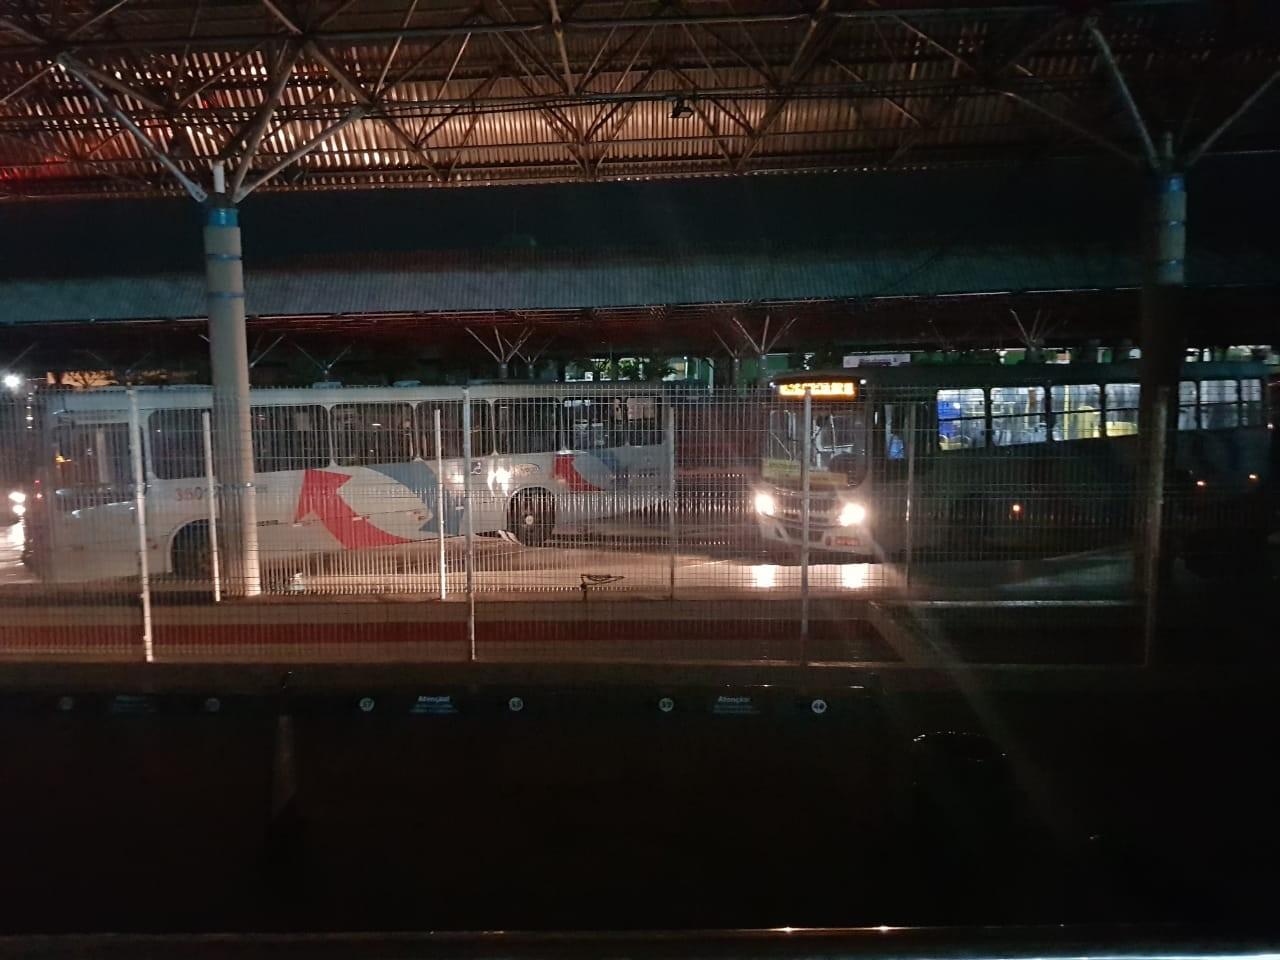 Falta de luz deixa passageiros do terminal do Antônio Bezerra às escuras, em Fortaleza